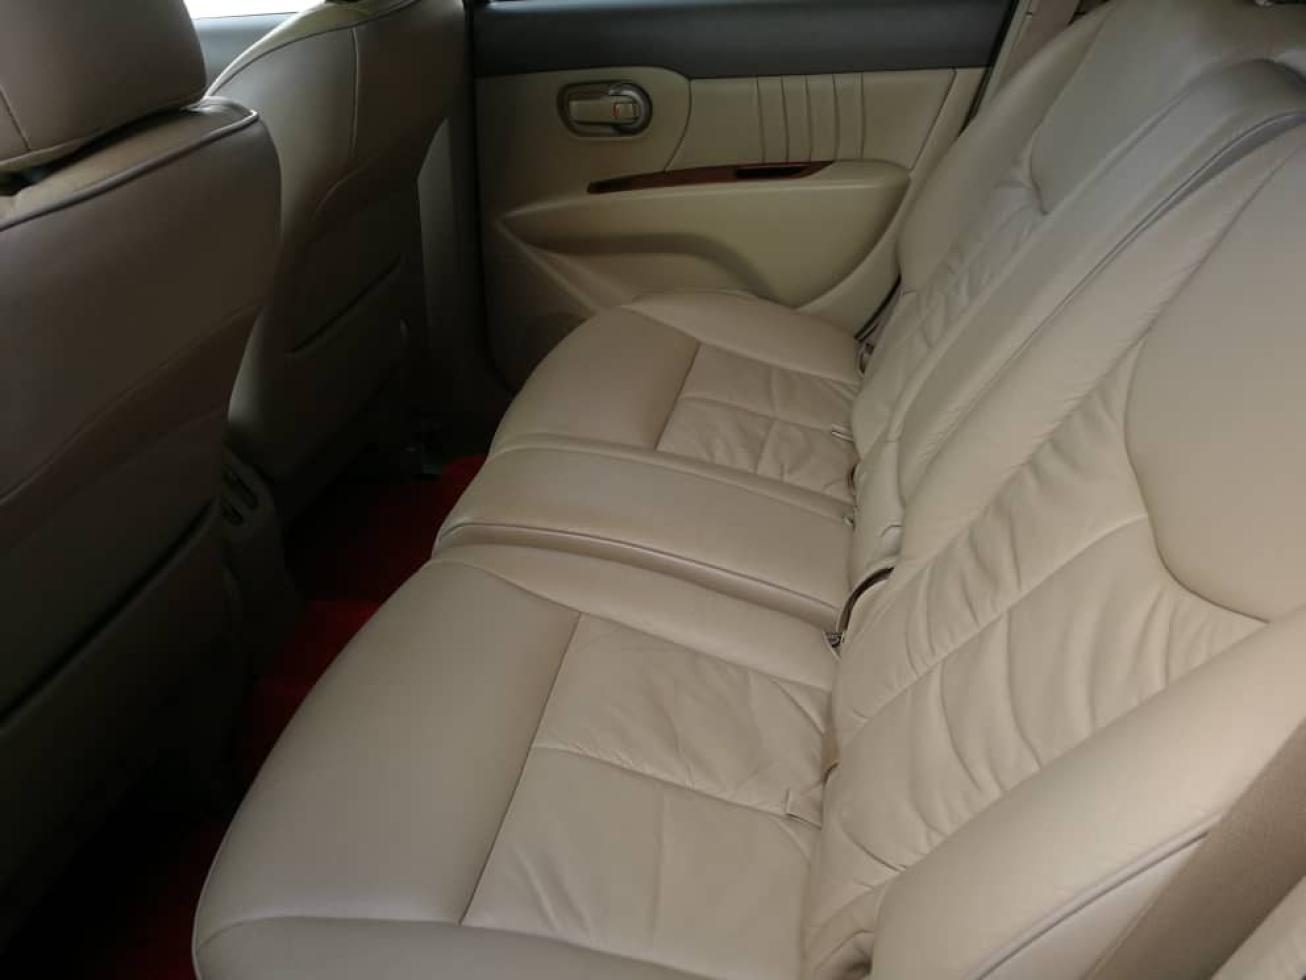 2009 Nissan GRAND LIVINA 1.8 IMPUL (A) Full Loan